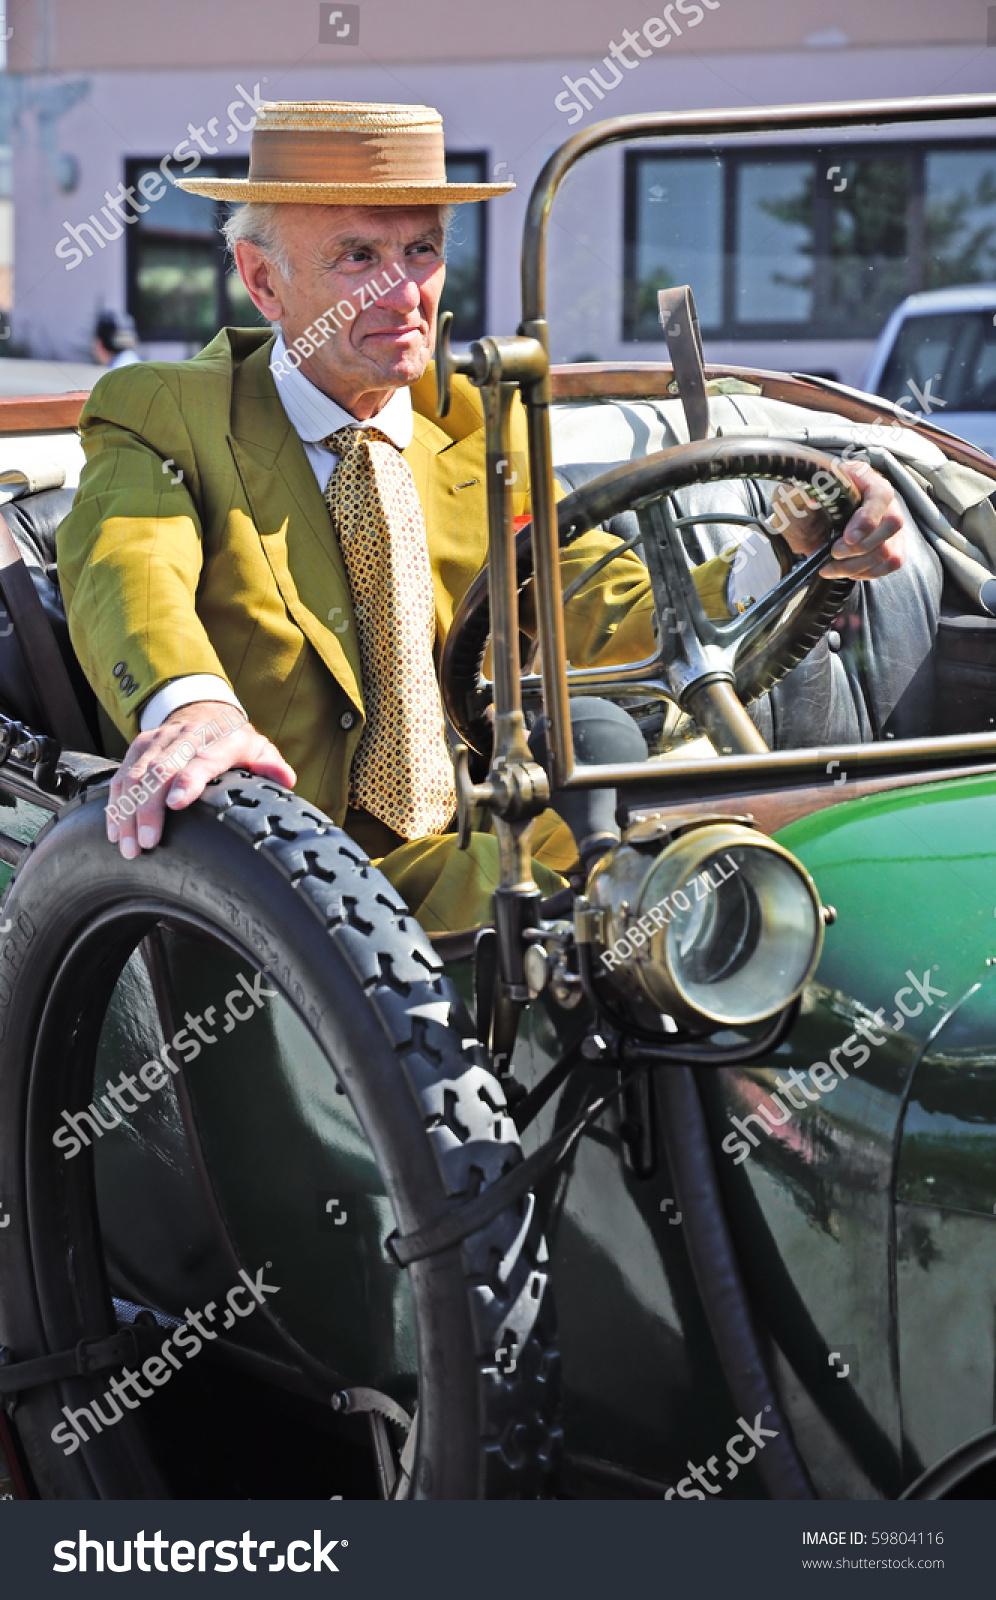 Ceva Cn August 21 Vintage Car Stock Photo 59804116 - Shutterstock